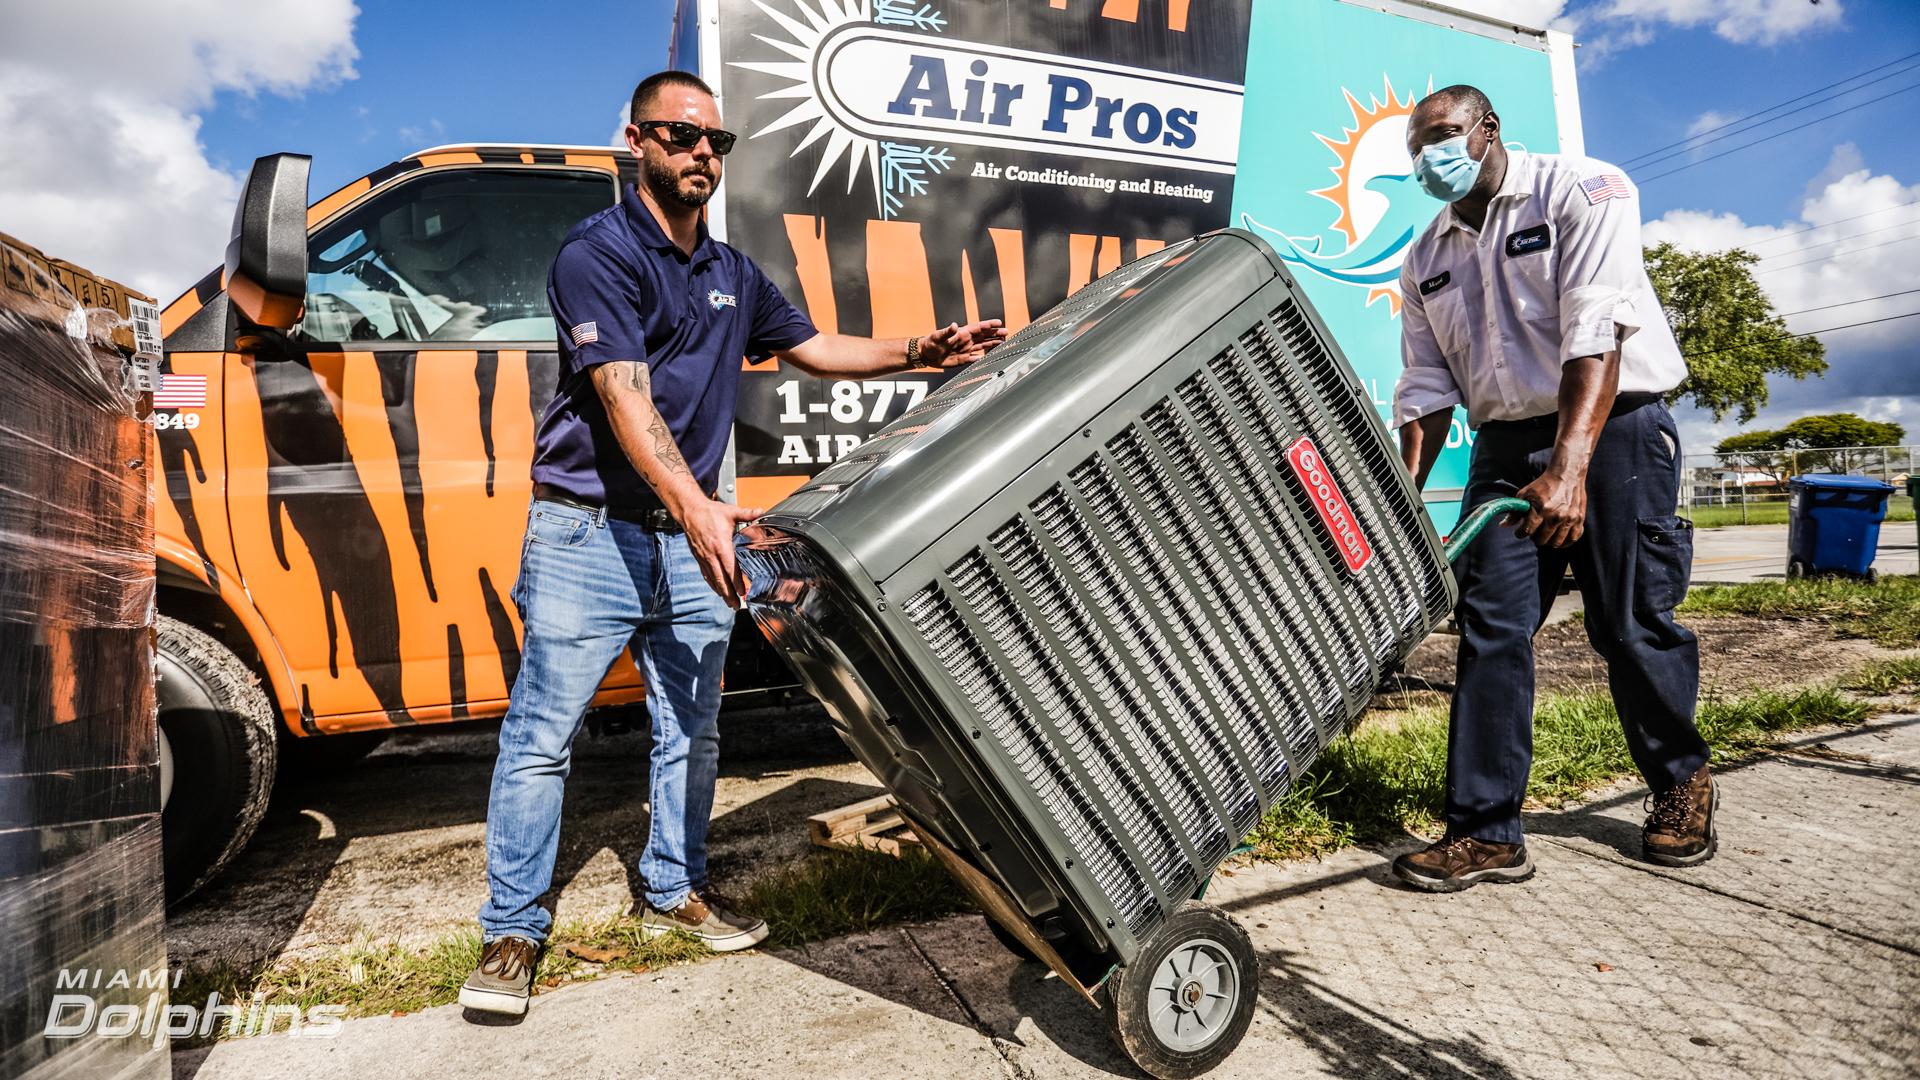 The Miami Dolphins partake in  AirPros Surprise Donation at Miami Gardens, on July 15th, 2021. (Jose A. Pineiro/Miami Dolphins)